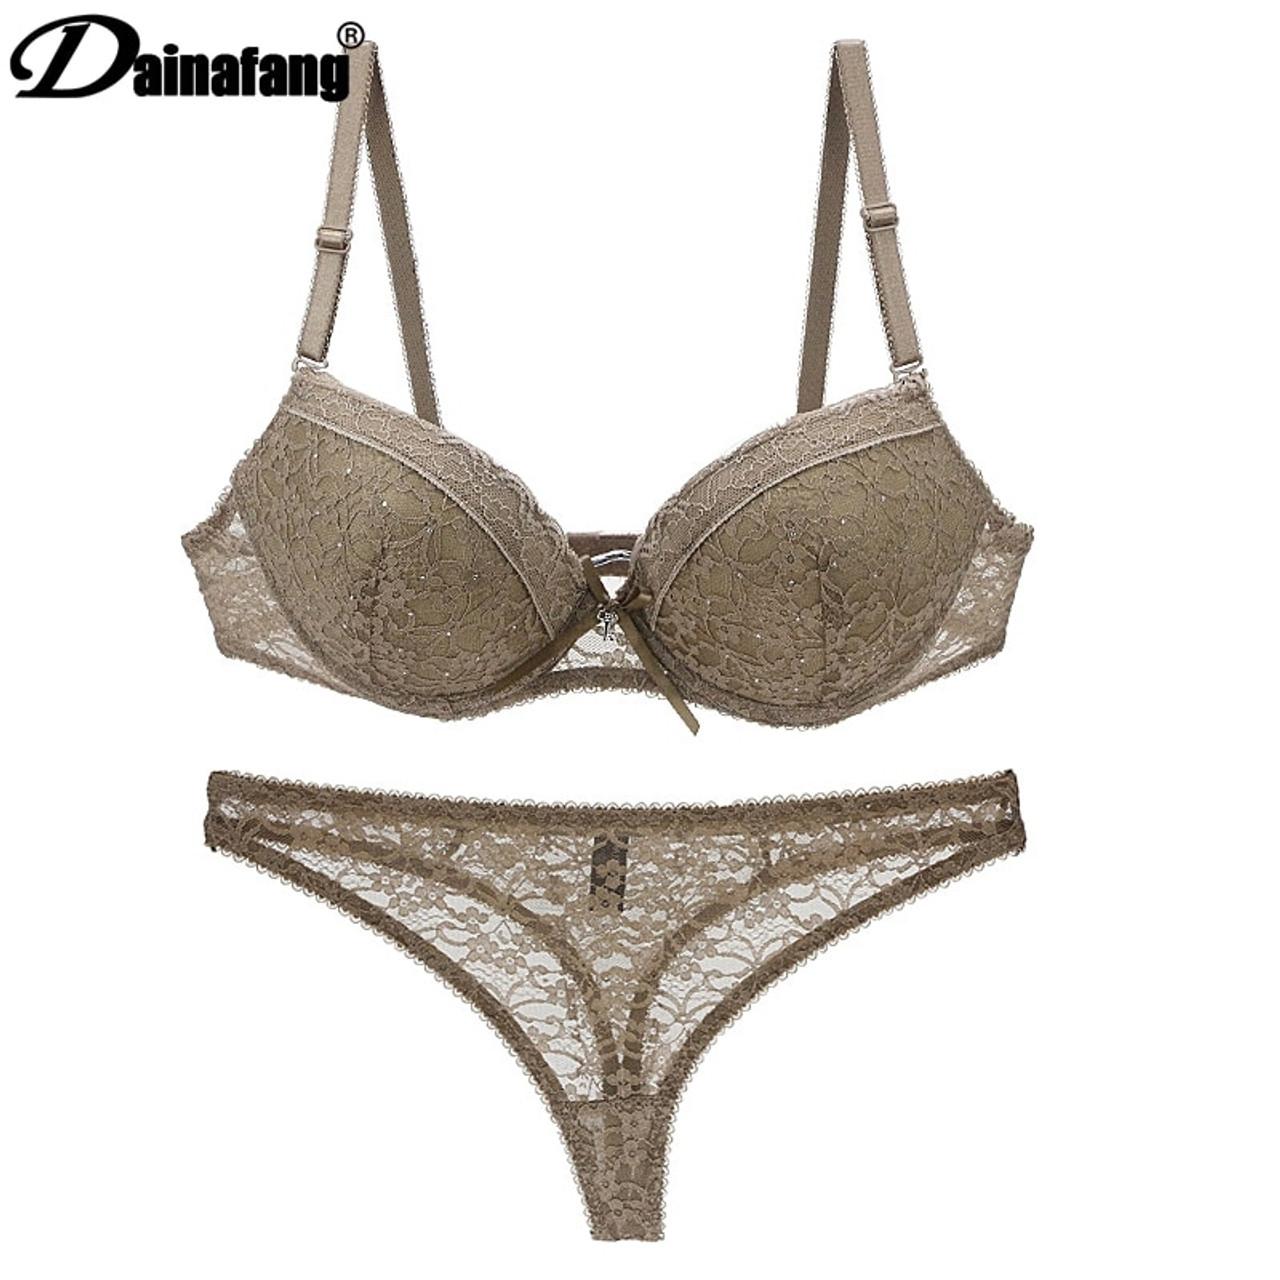 e0d4ea6248f0 ... Novelty 2019 Lace Drill Bra Set Women Plus Size Push Up Underwear Set  Bra And For ...